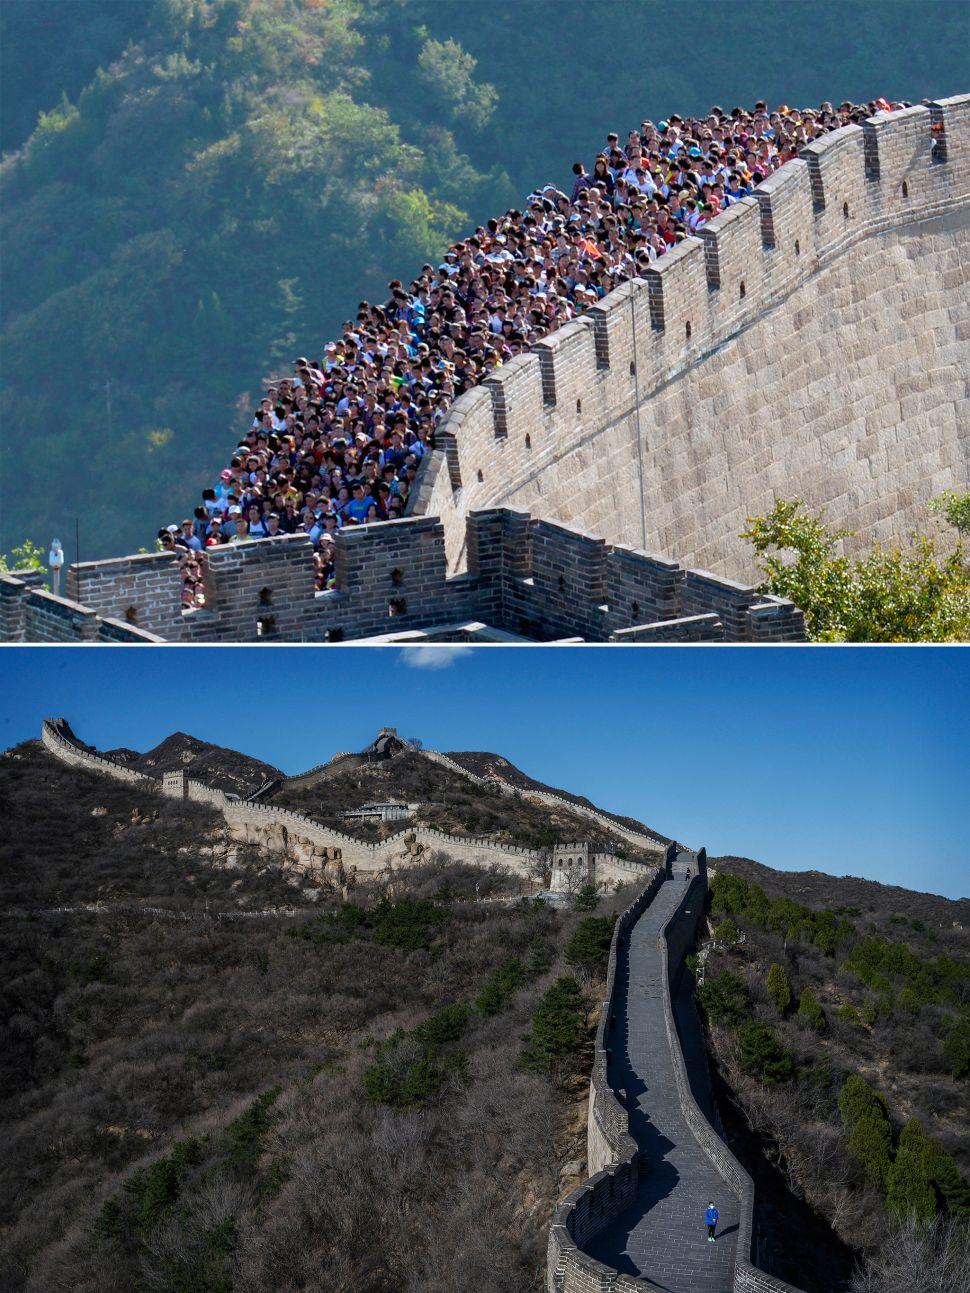 Great Wall of China before and after coronavirus